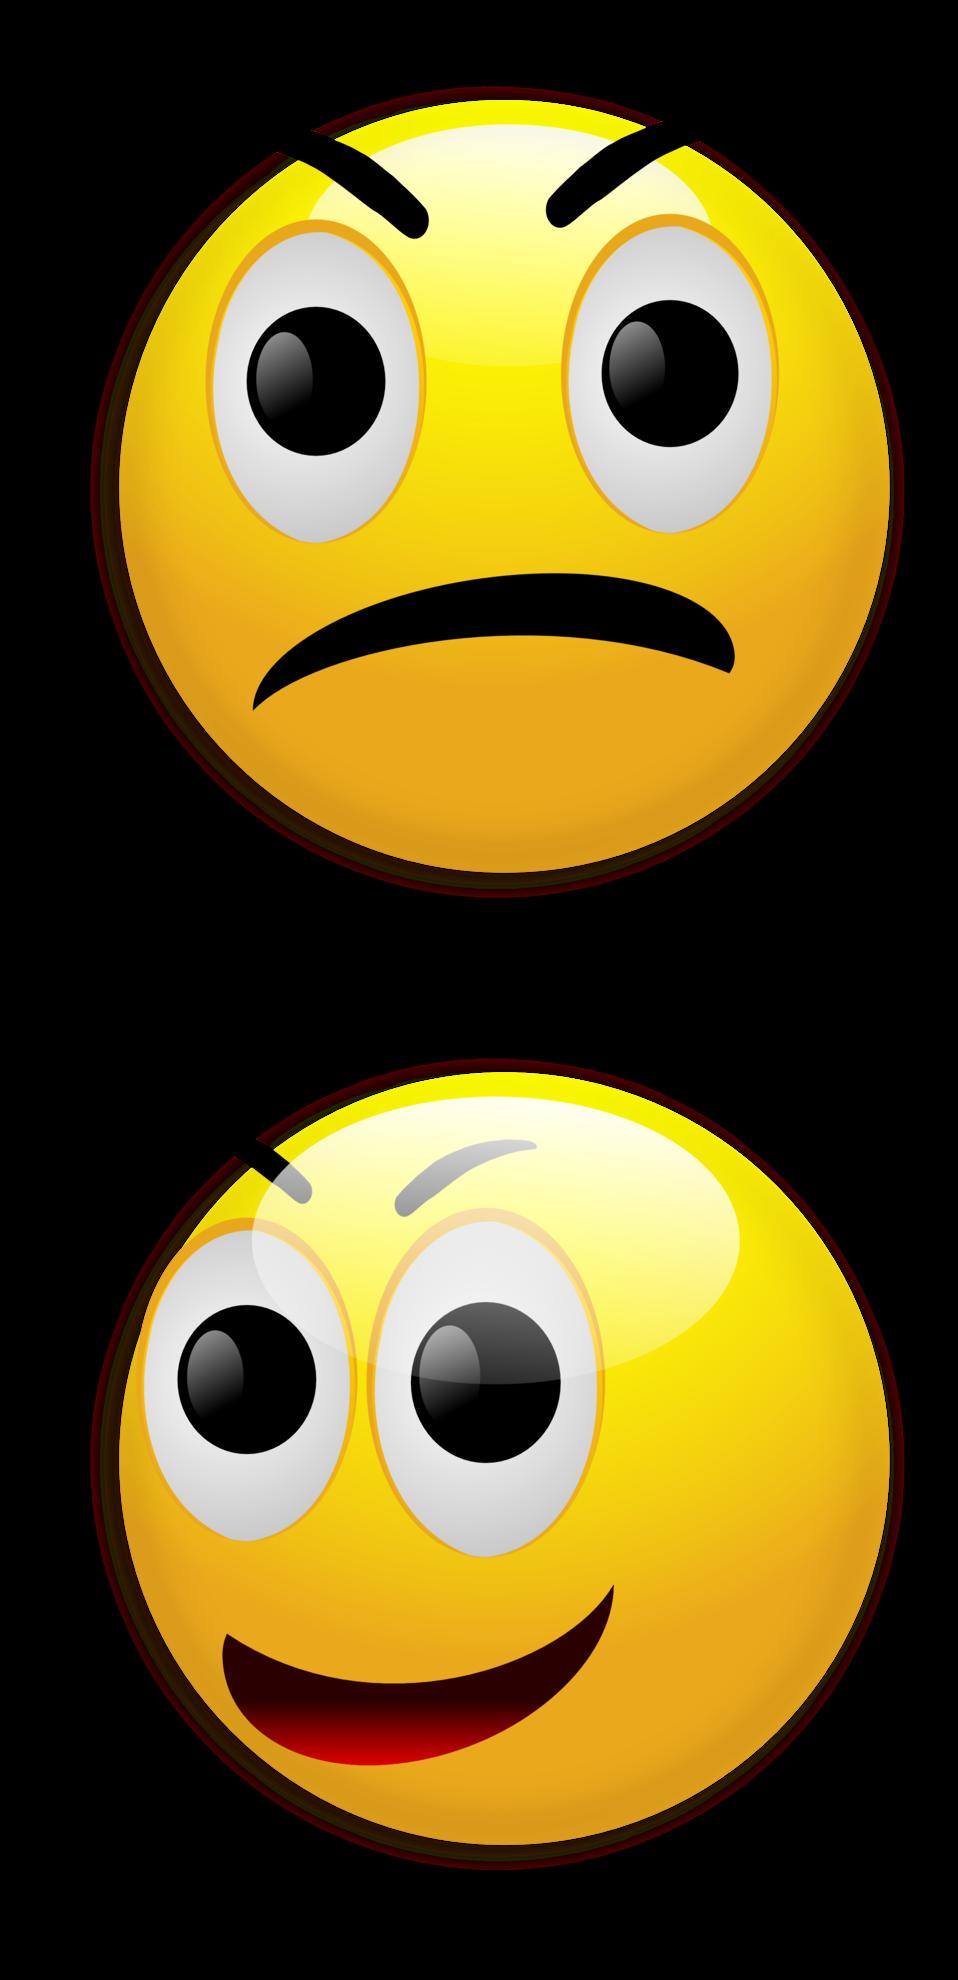 Smiley 7